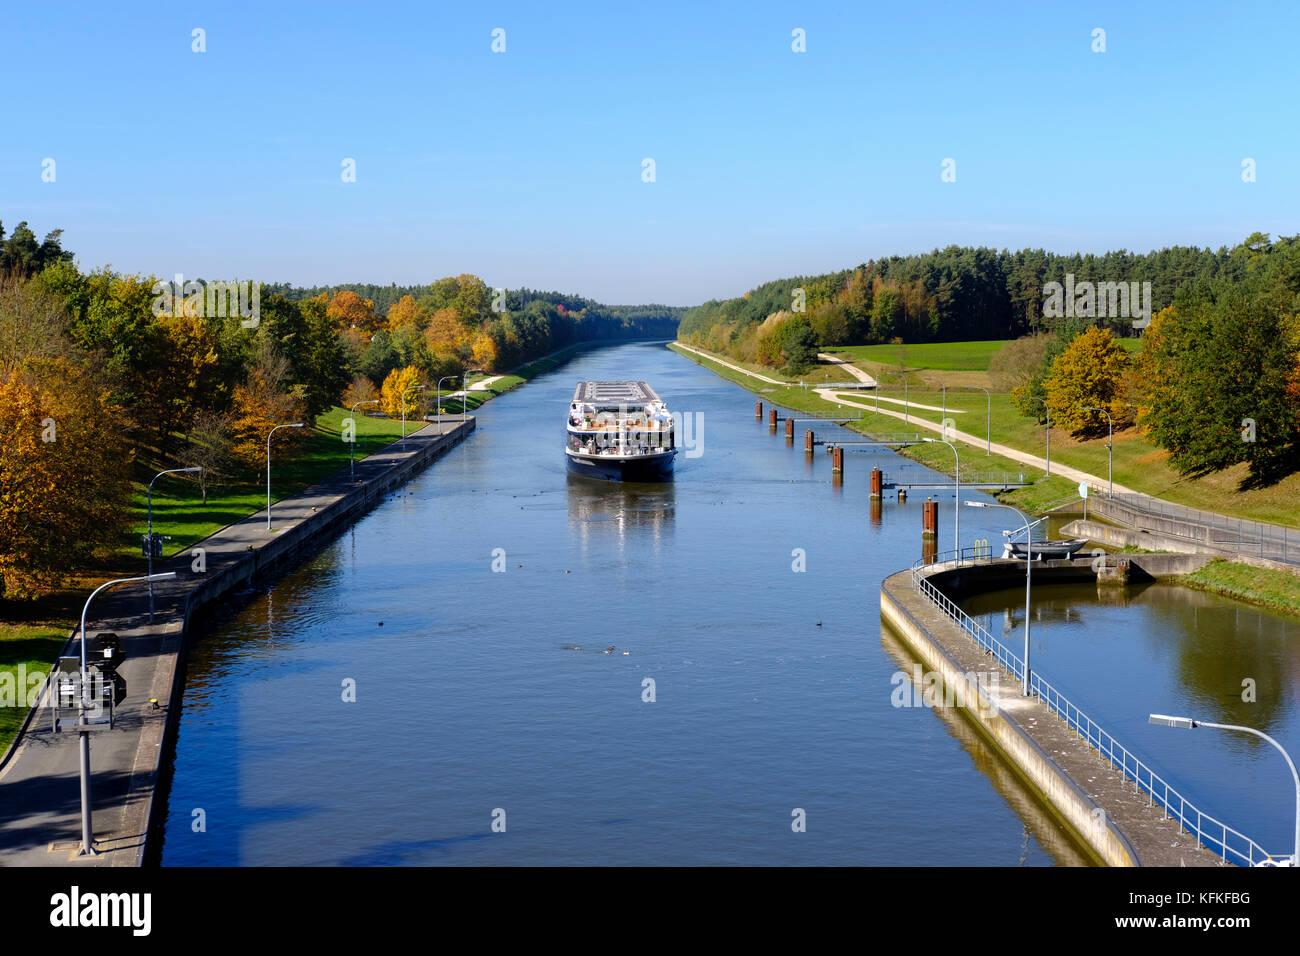 Canal cruise danube